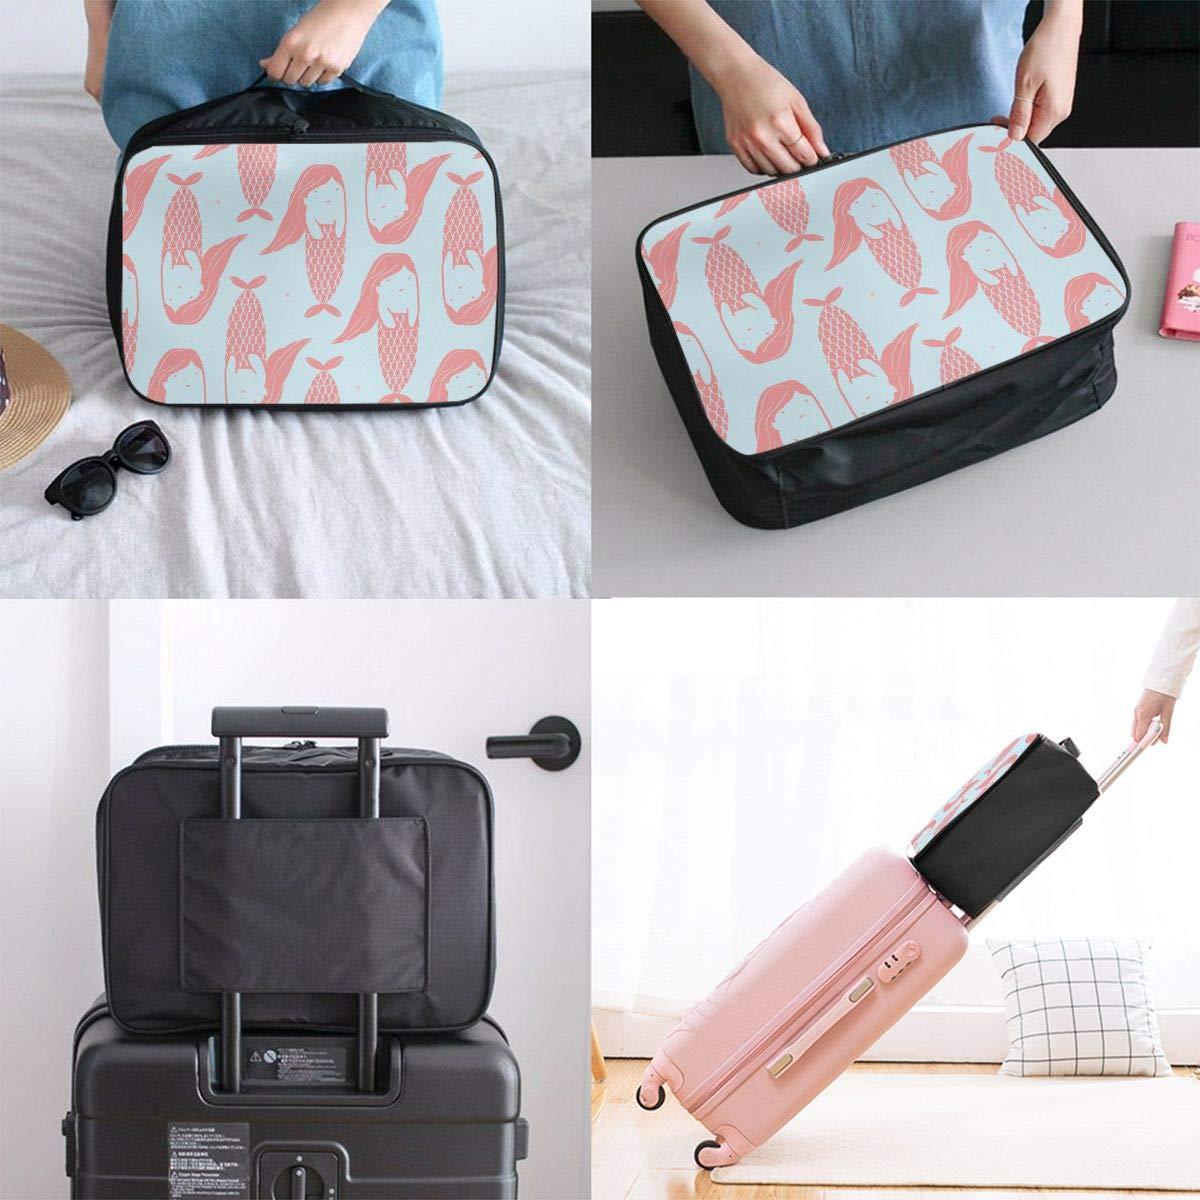 YueLJB Milkshake Mermaid Lightweight Large Capacity Portable Luggage Bag Travel Duffel Bag Storage Carry Luggage Duffle Tote Bag